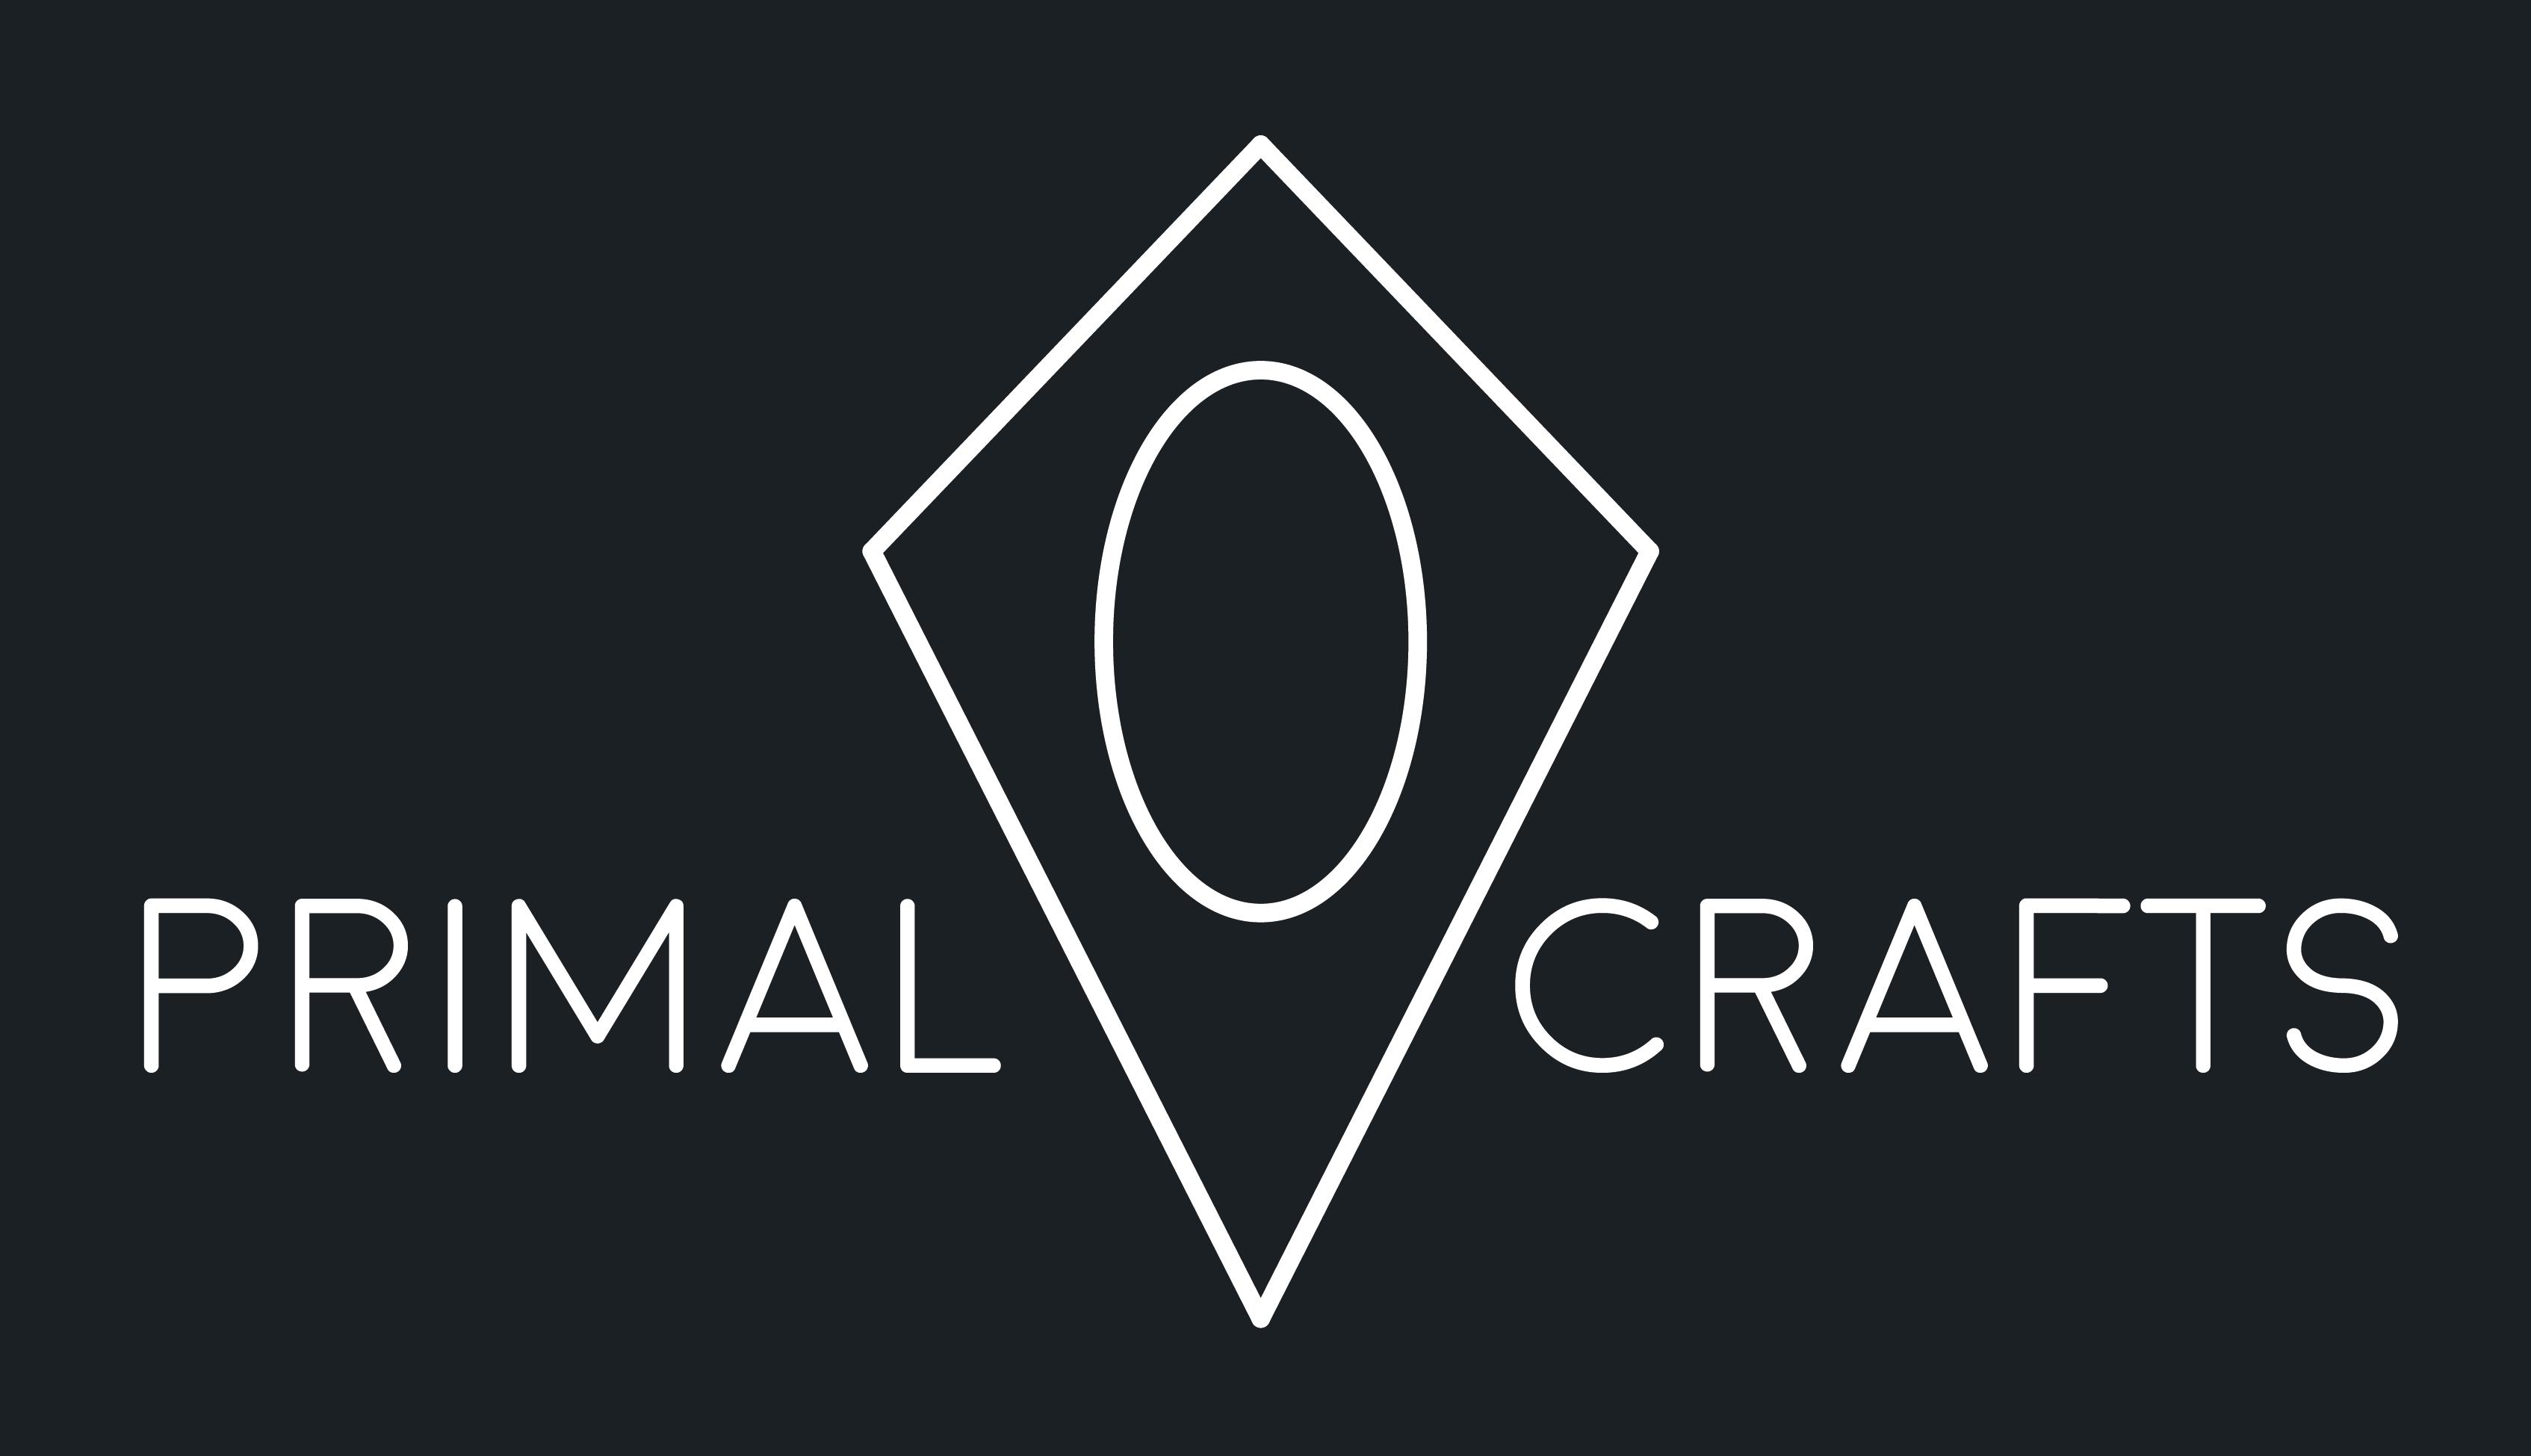 Primal Crafts